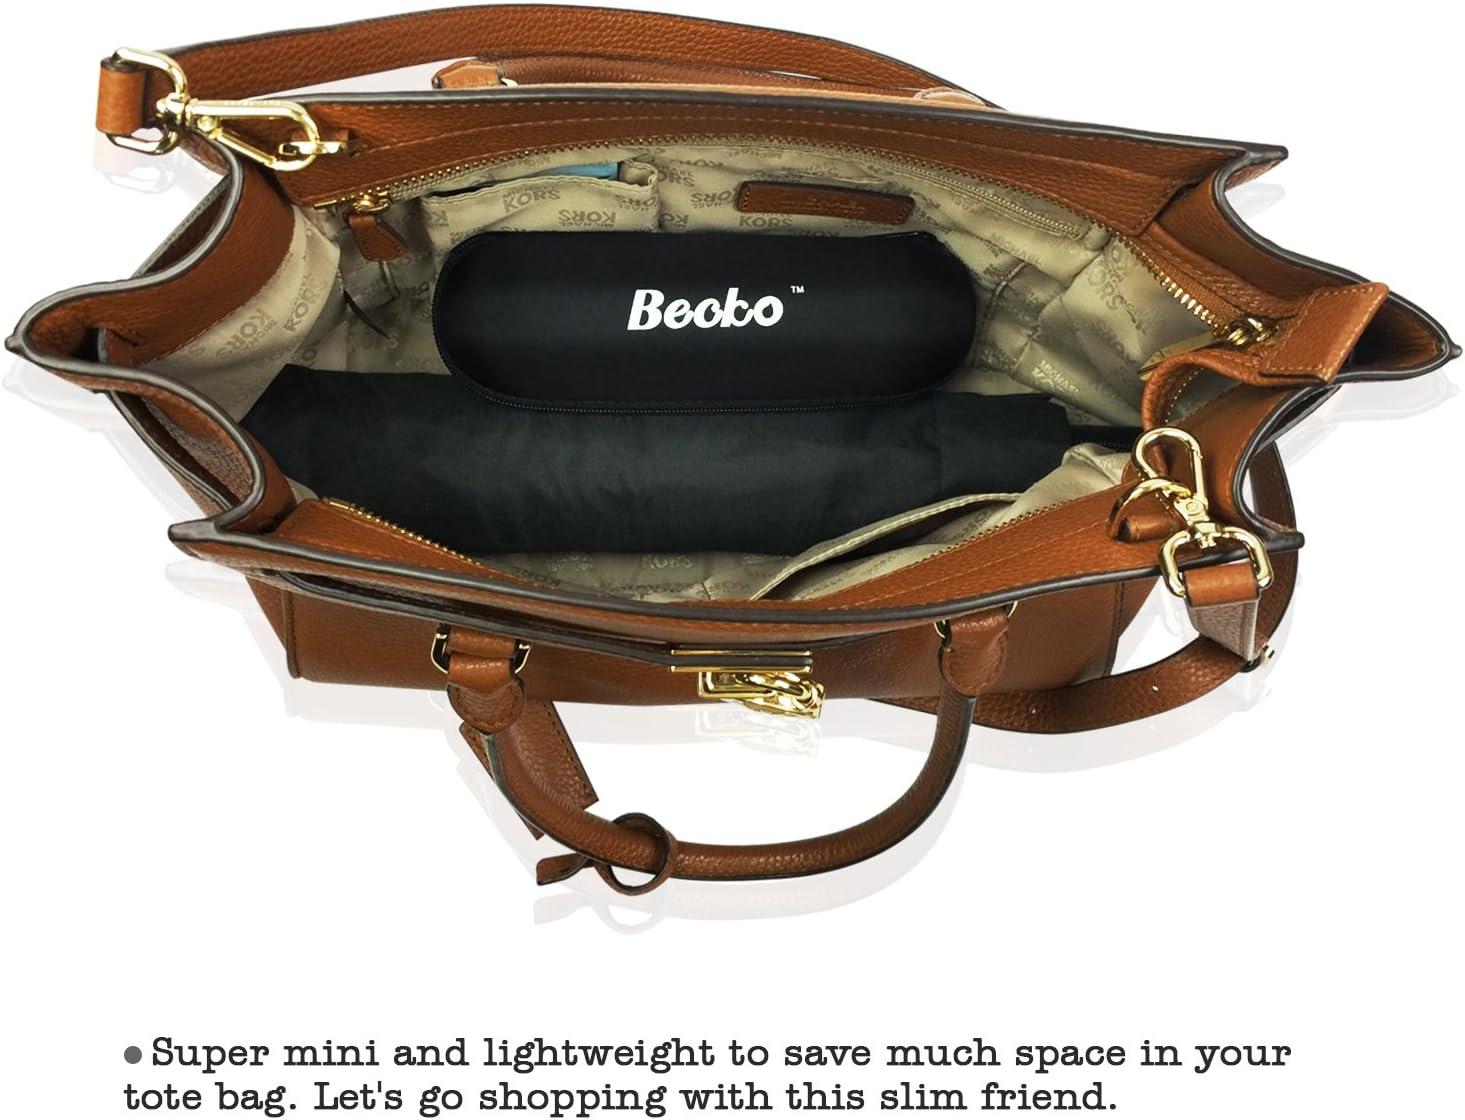 Becko Mini Kids Travel Foldable Pocket Umbrella 5-Fold Rain Umbrella with Waterproof Case